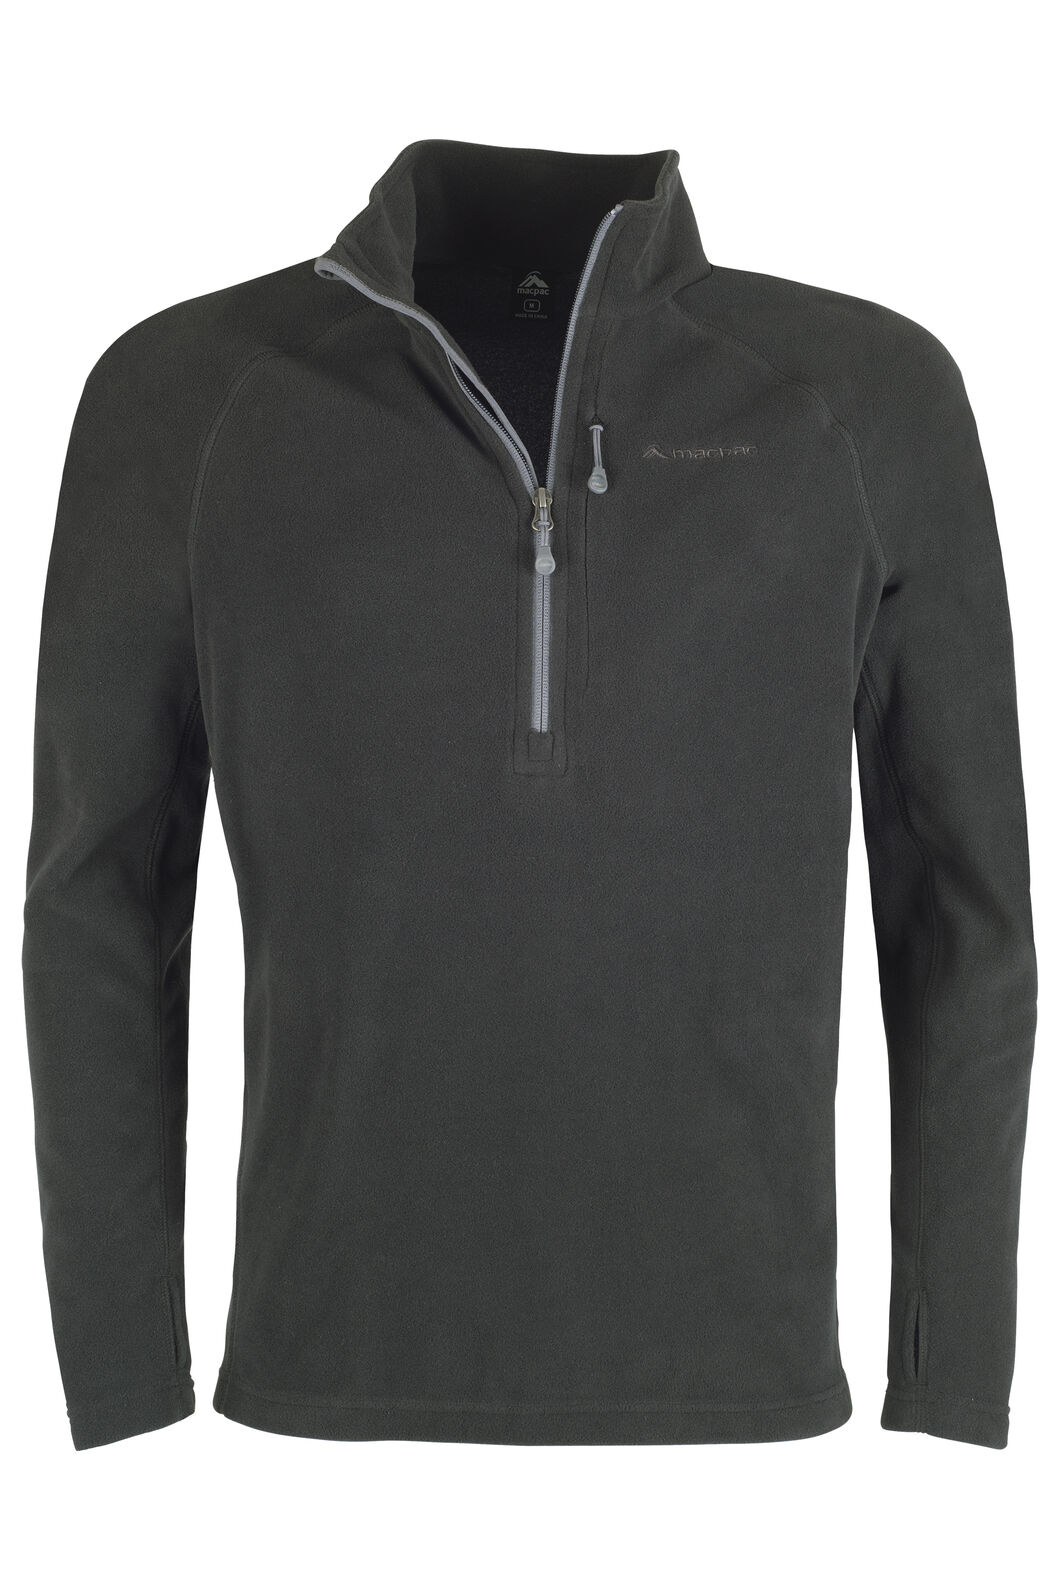 Macpac Tui Polartec® Micro Fleece® Pullover — Men's, Black, hi-res